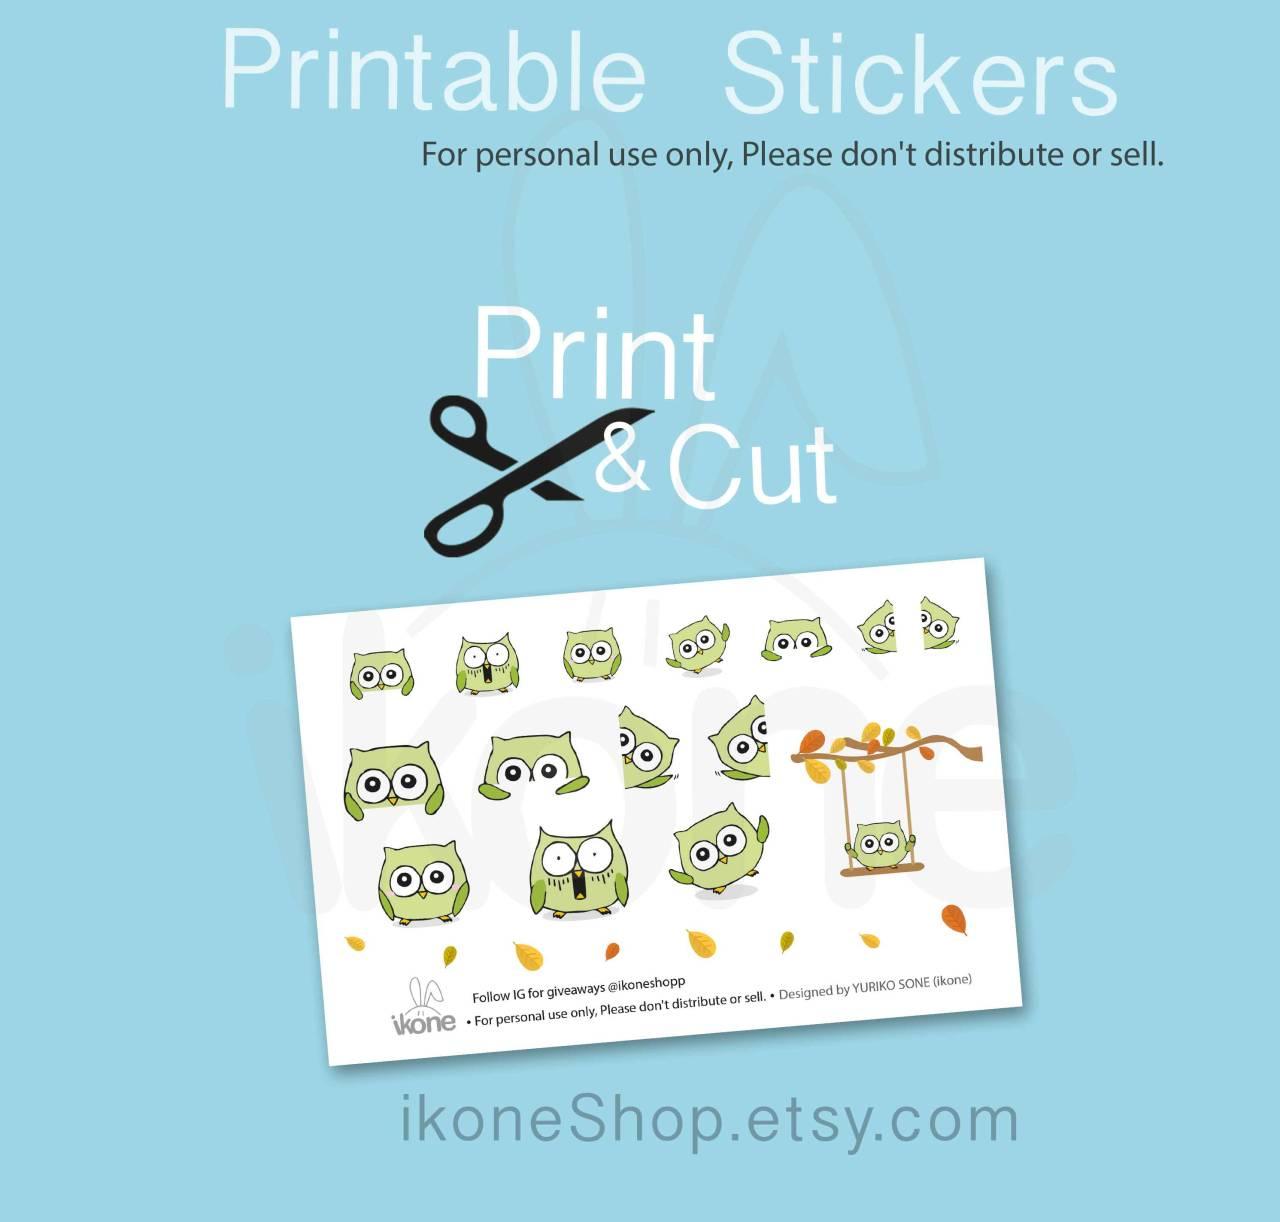 photograph regarding Printable Stickers Tumblr named Well known Printable Etsy Tumblr Stickers - Upon Log Wall